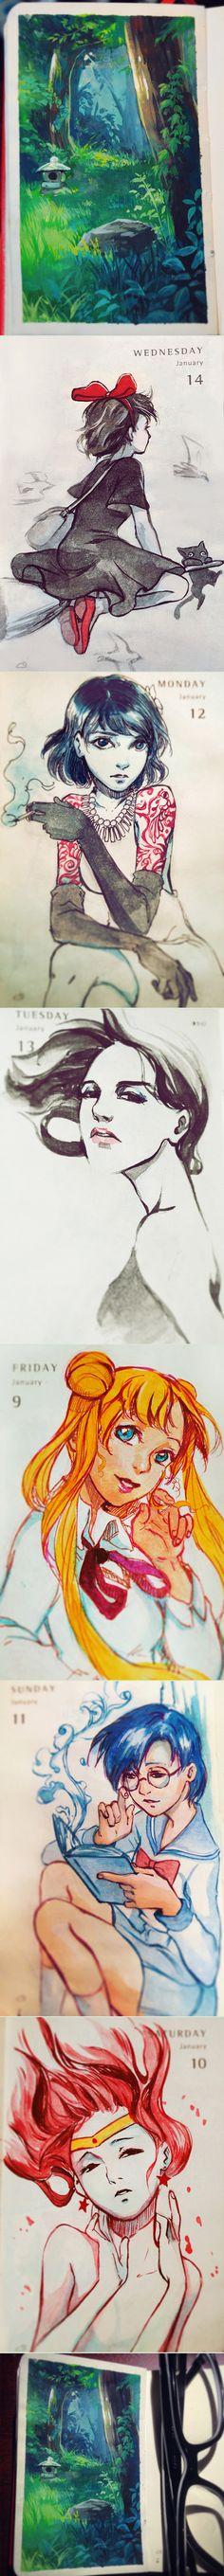 Daily Painting - week 2 by Qinni.deviantart.com on @DeviantArt